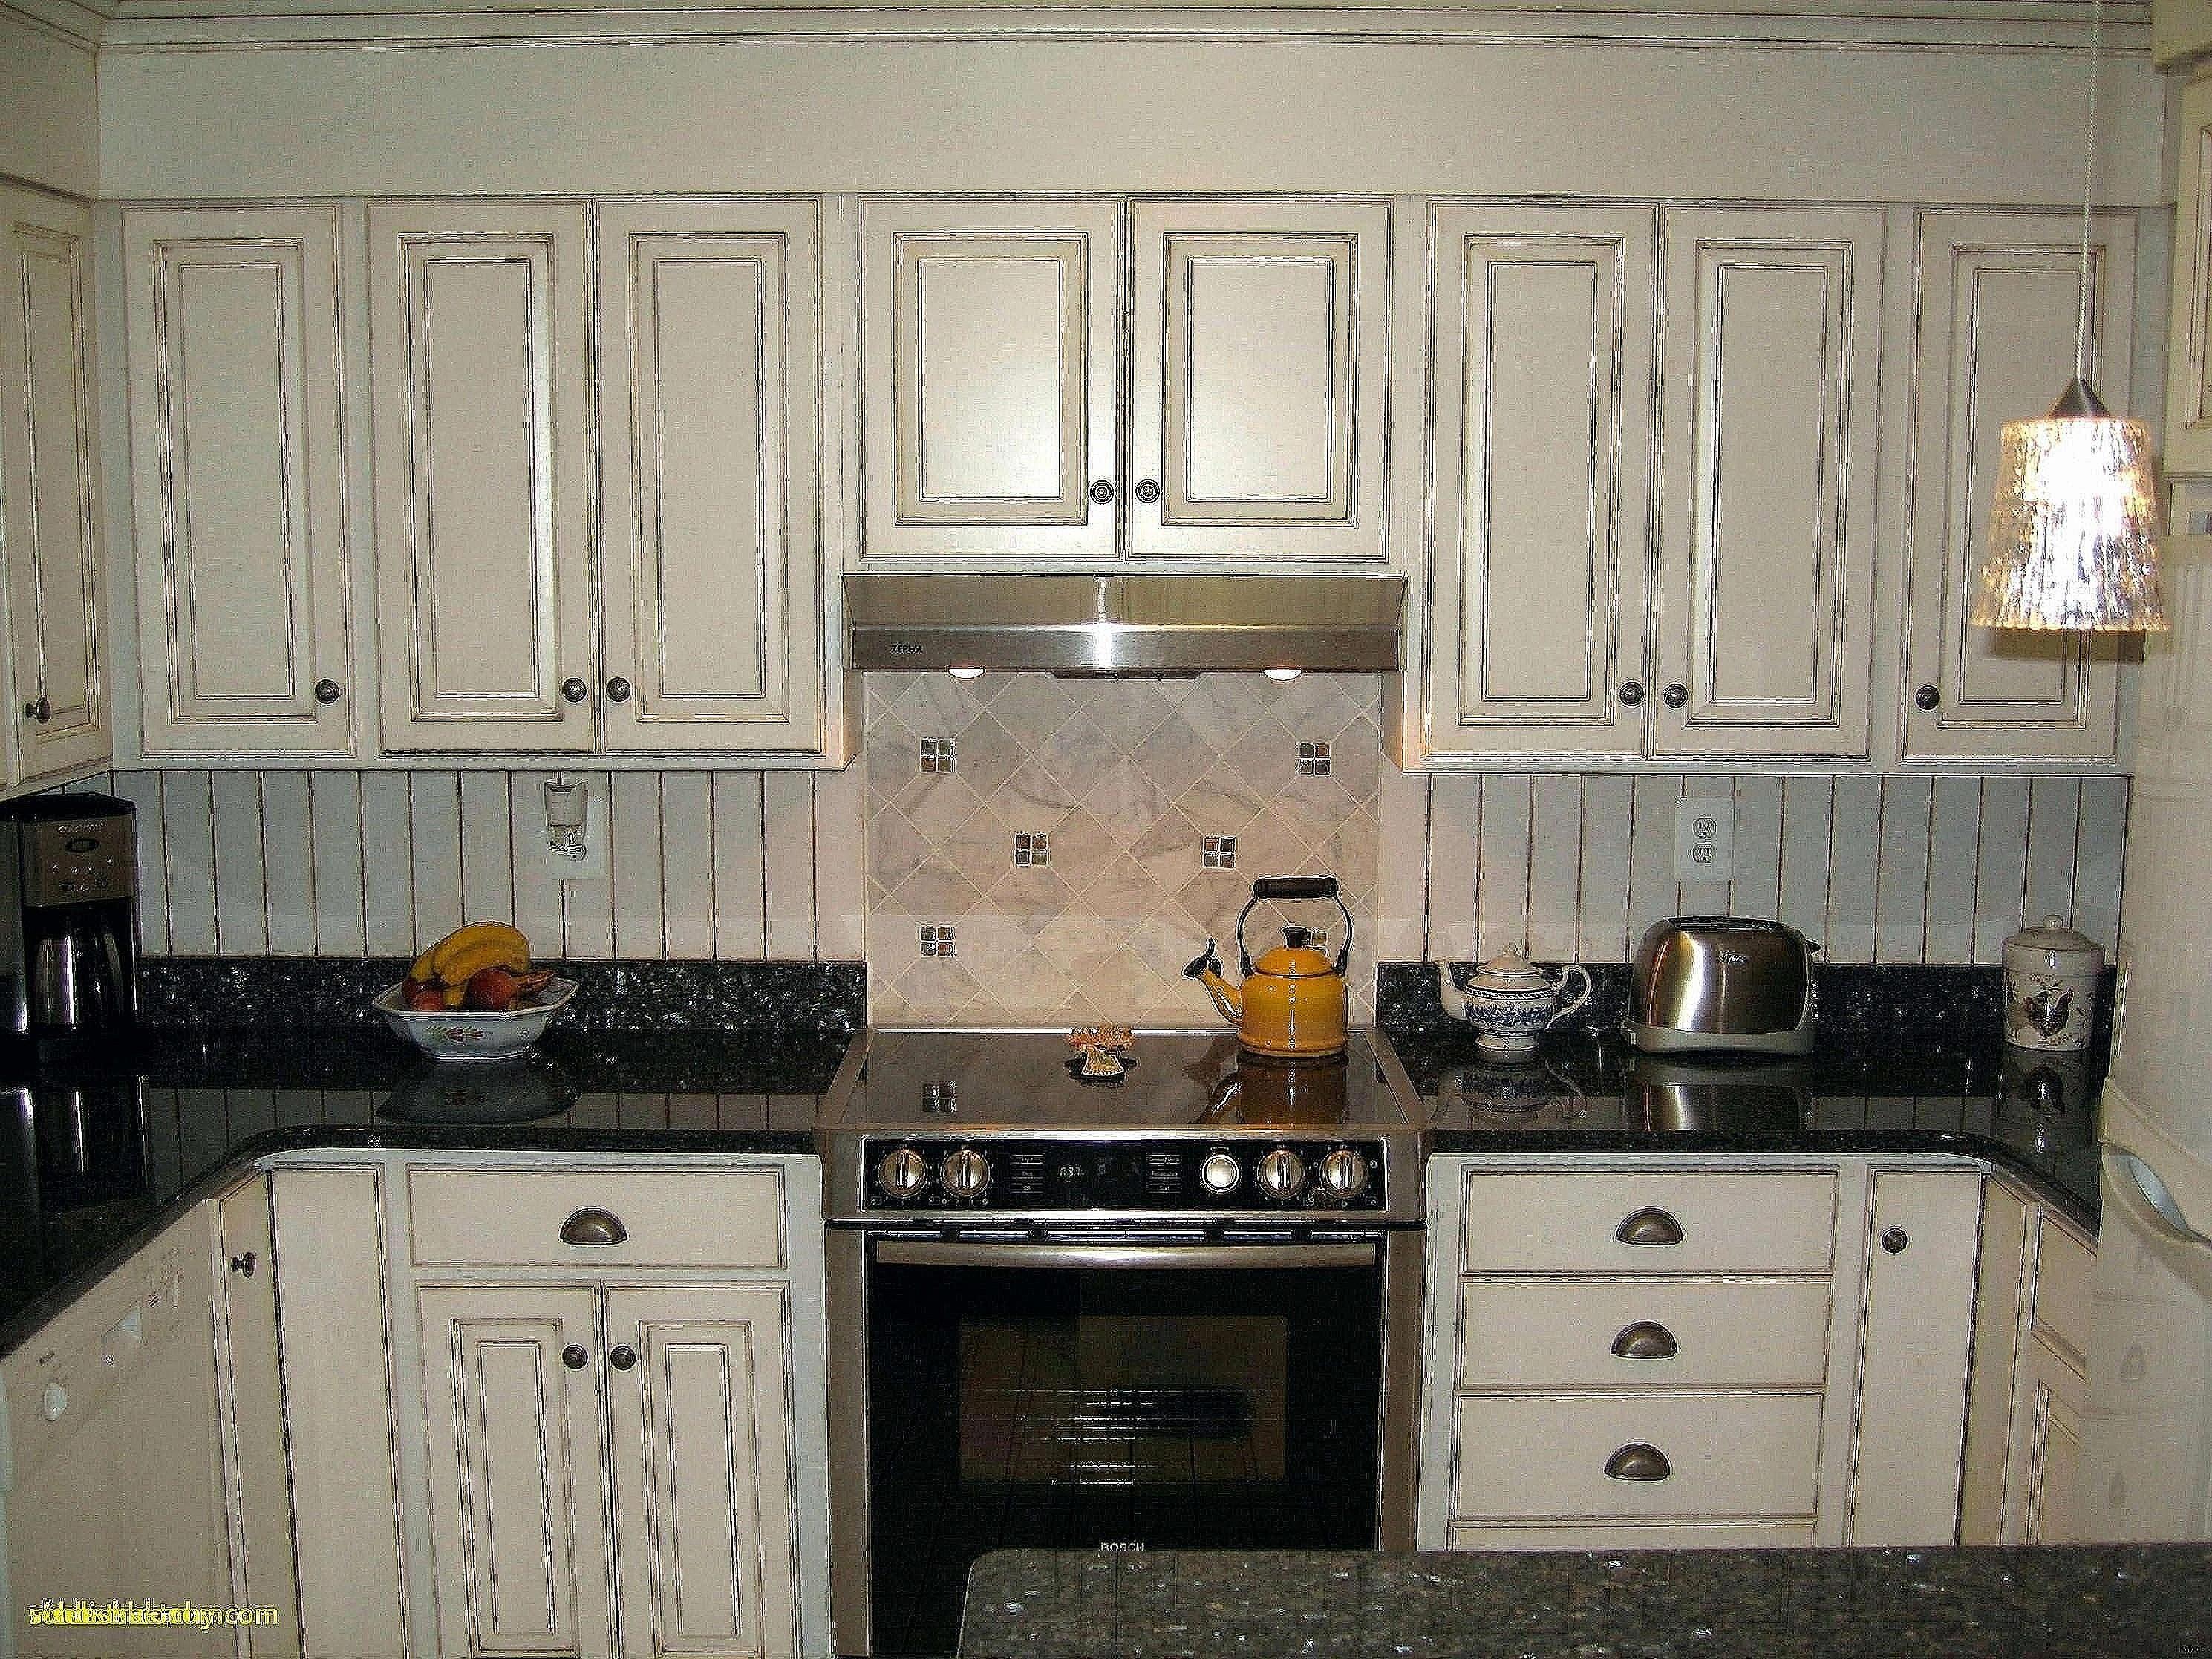 Lovely Backsplash For Kitchen Upper Kitchen Cabinets Used Kitchen Cabinets Kitchen Cabinets For Sale